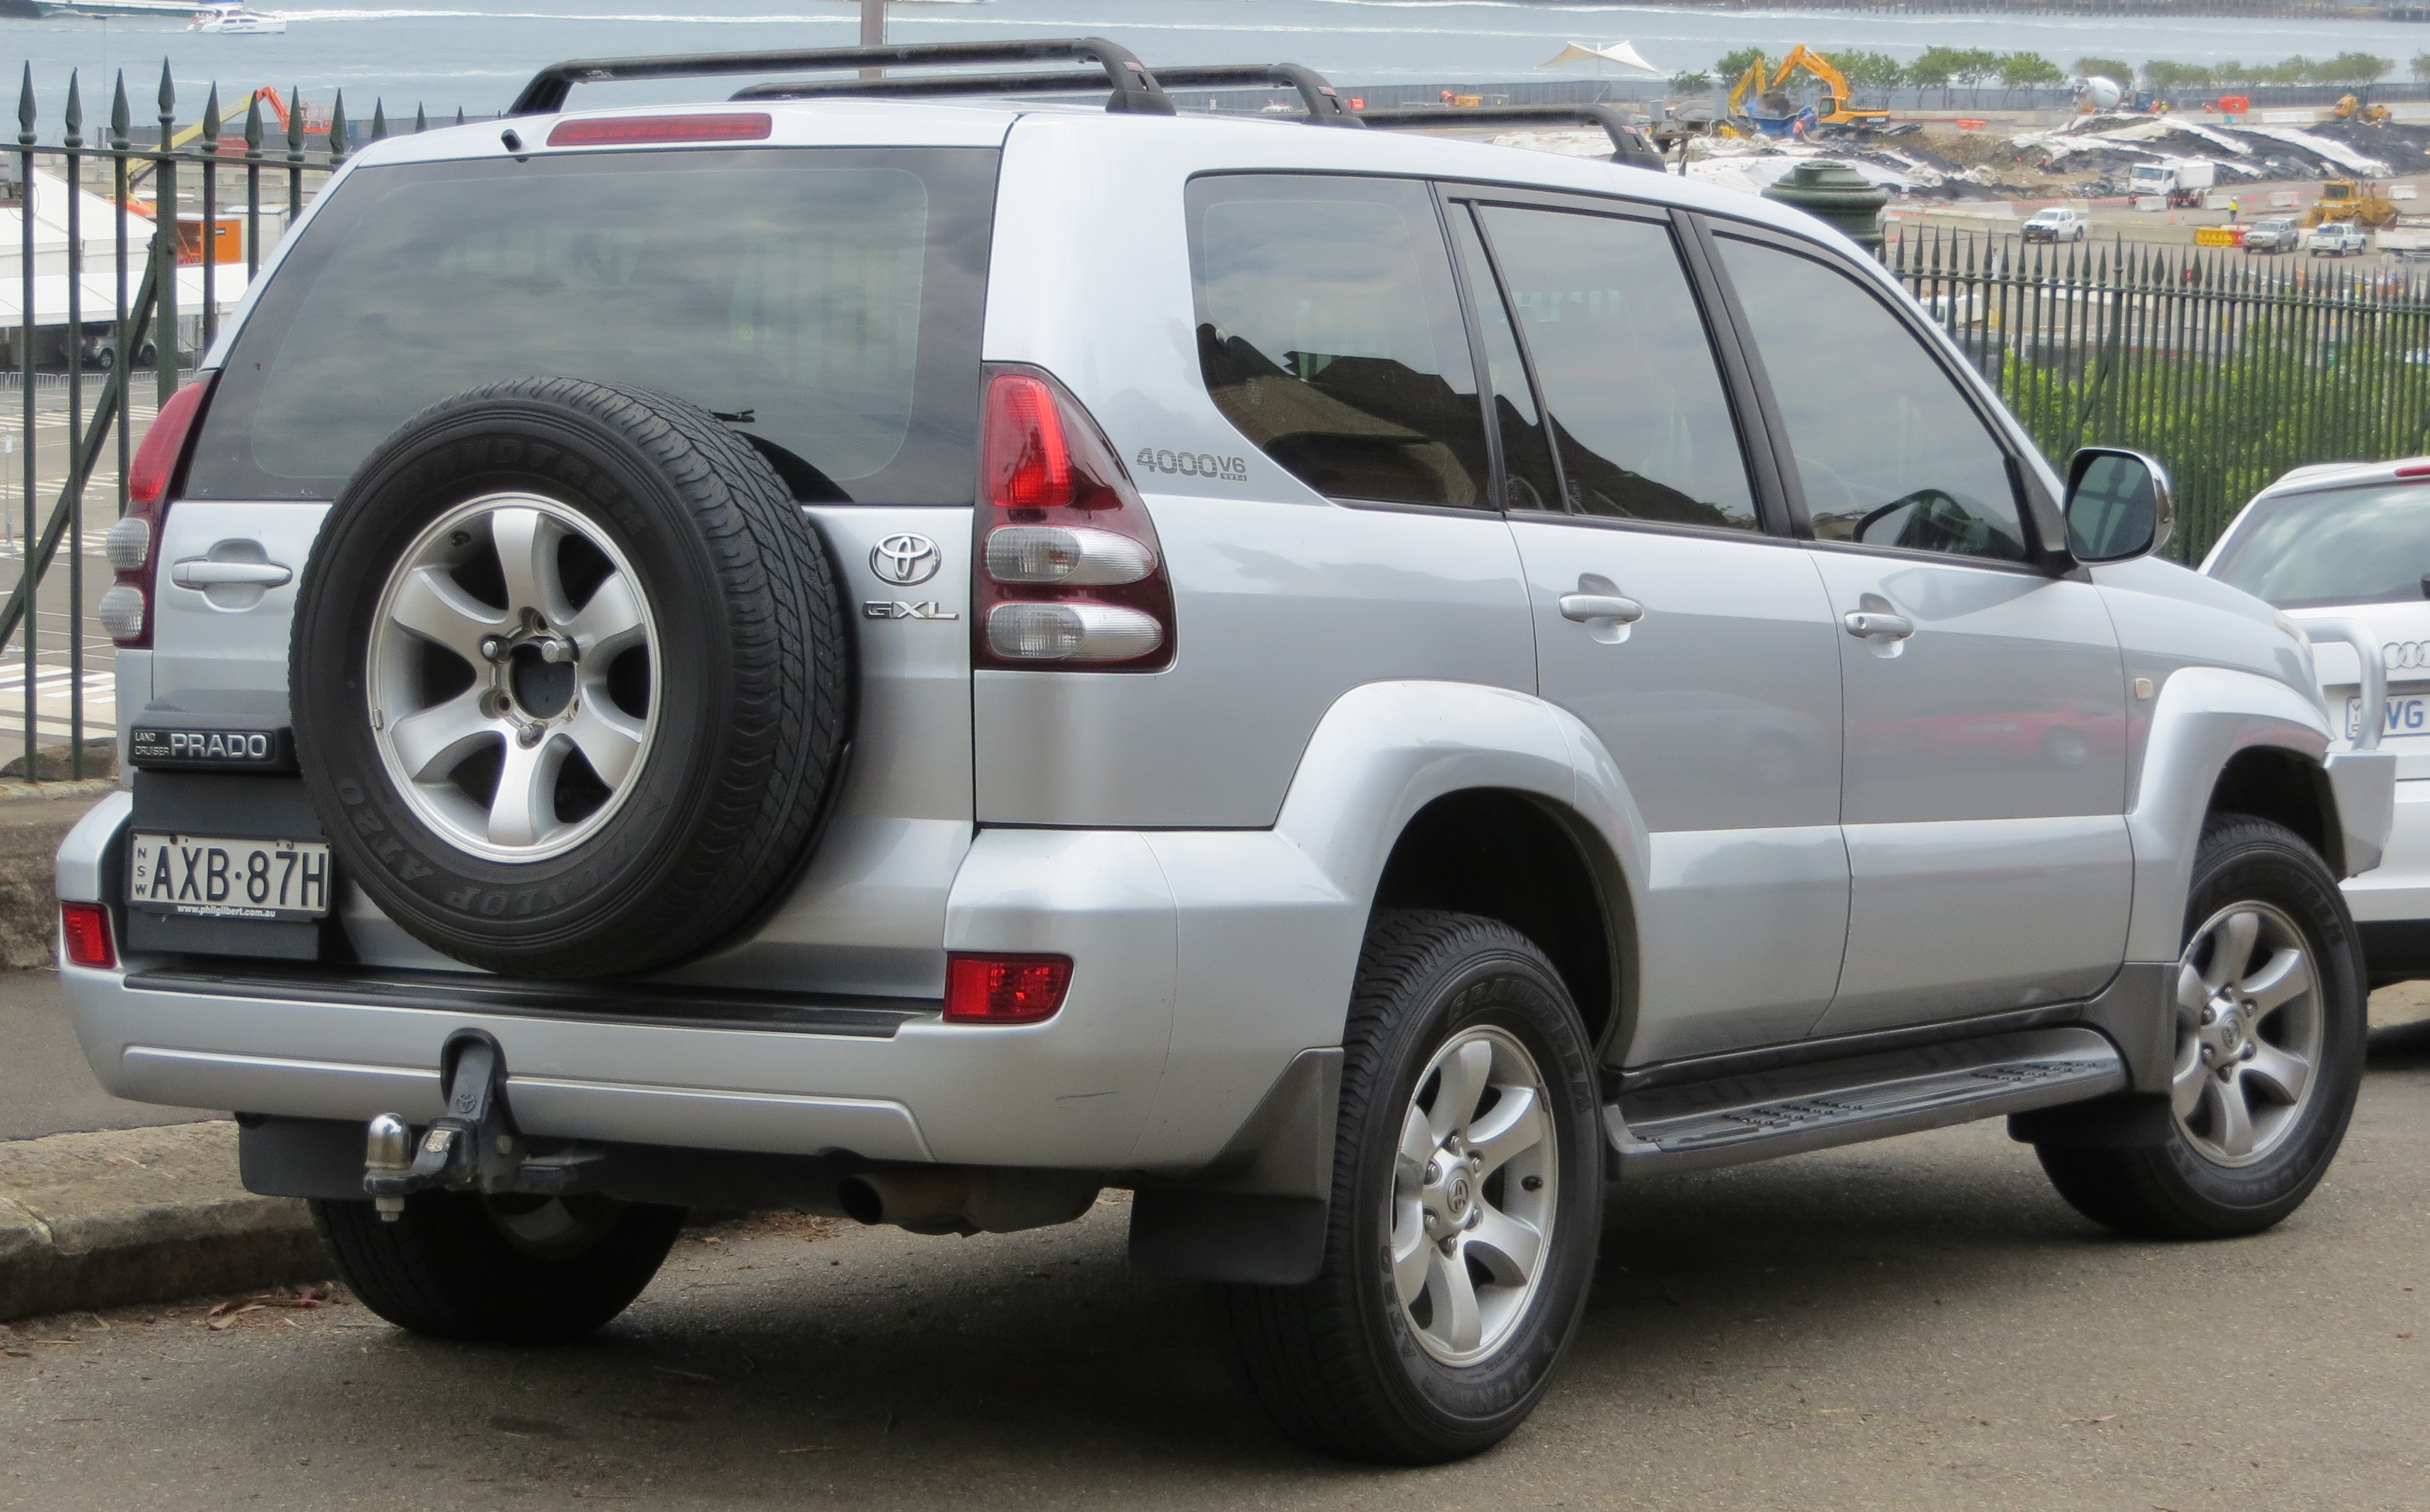 Kelebihan Toyota Prado 2005 Murah Berkualitas